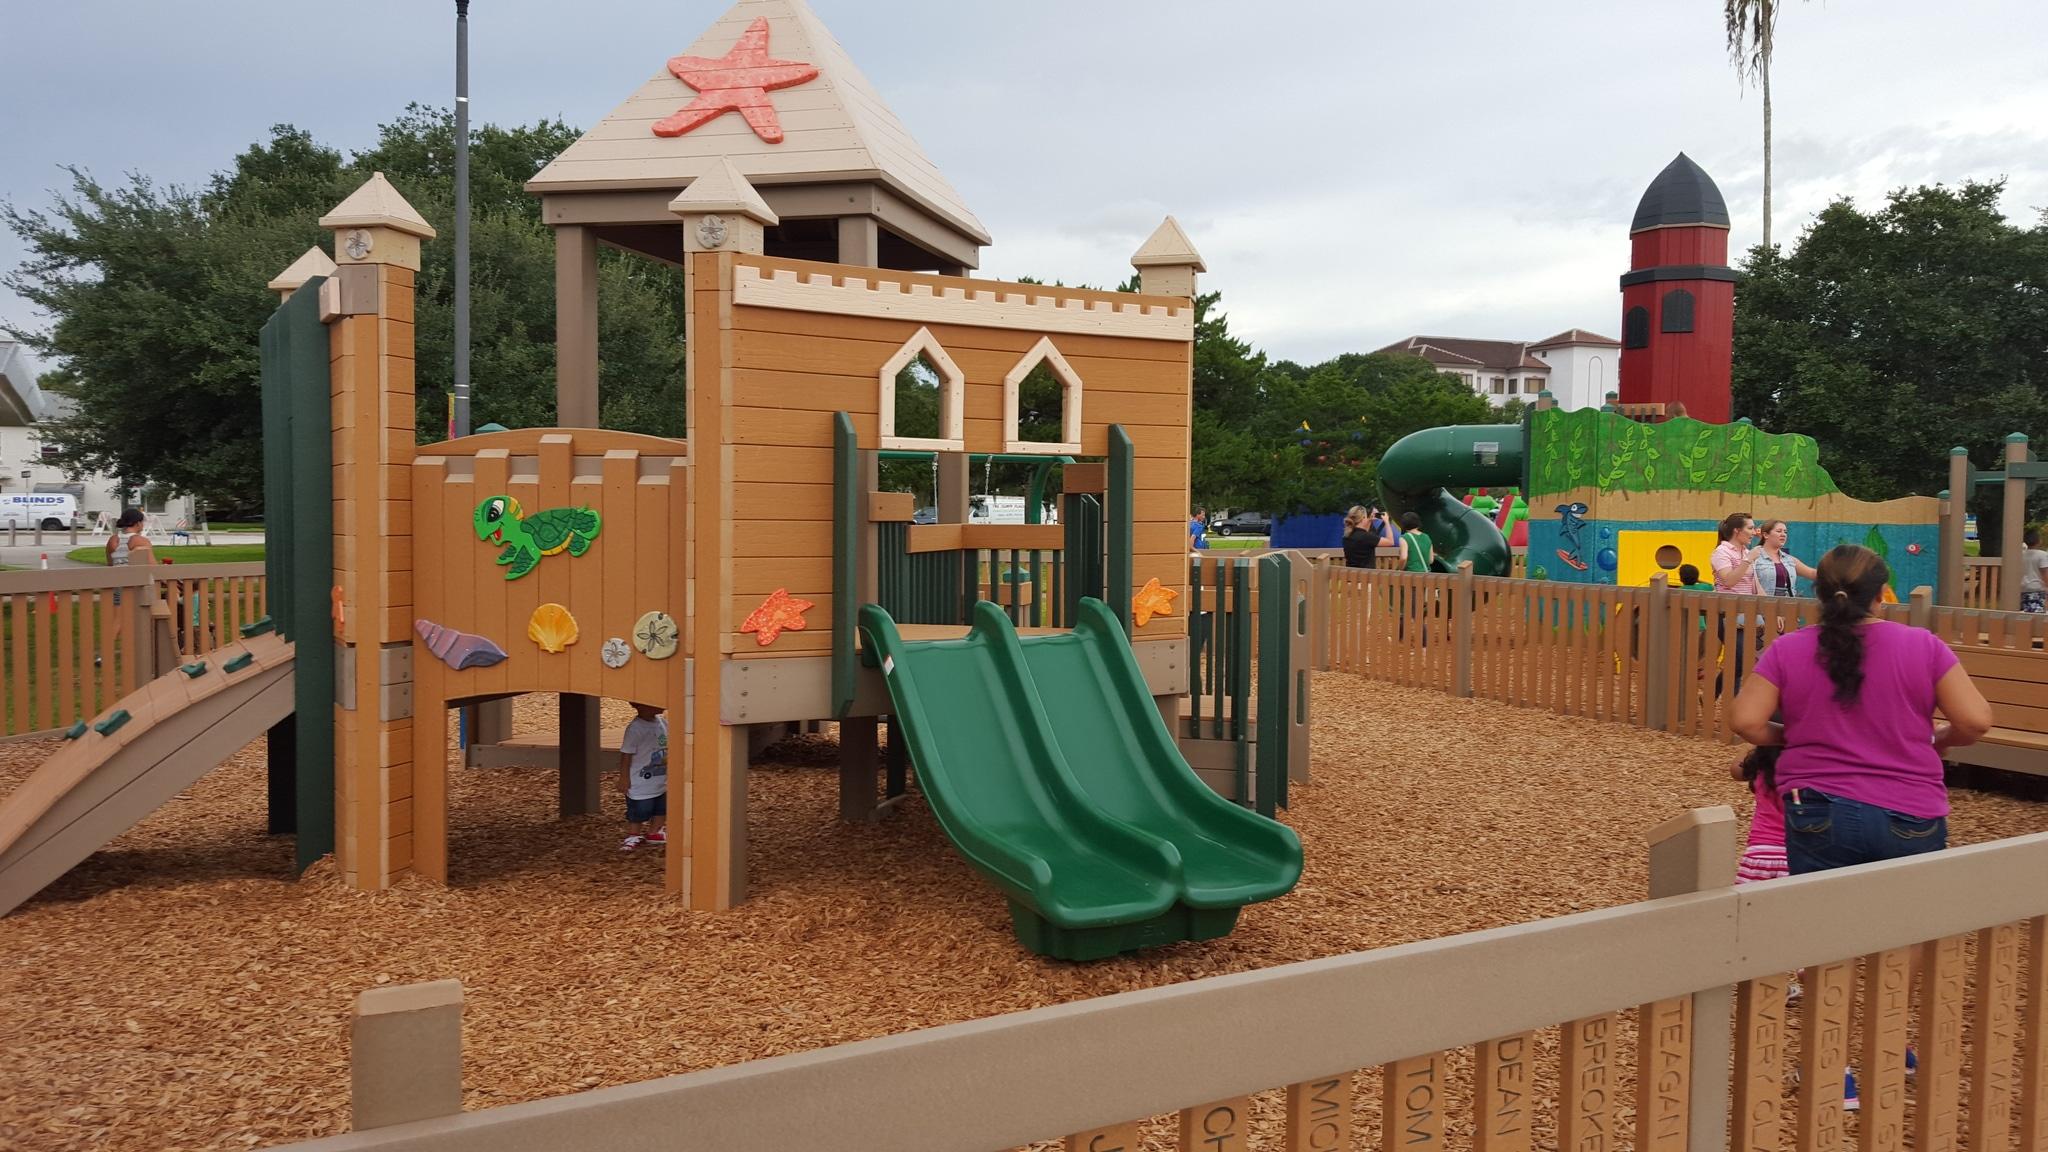 Manatee Playground City Of New Symrna Beach